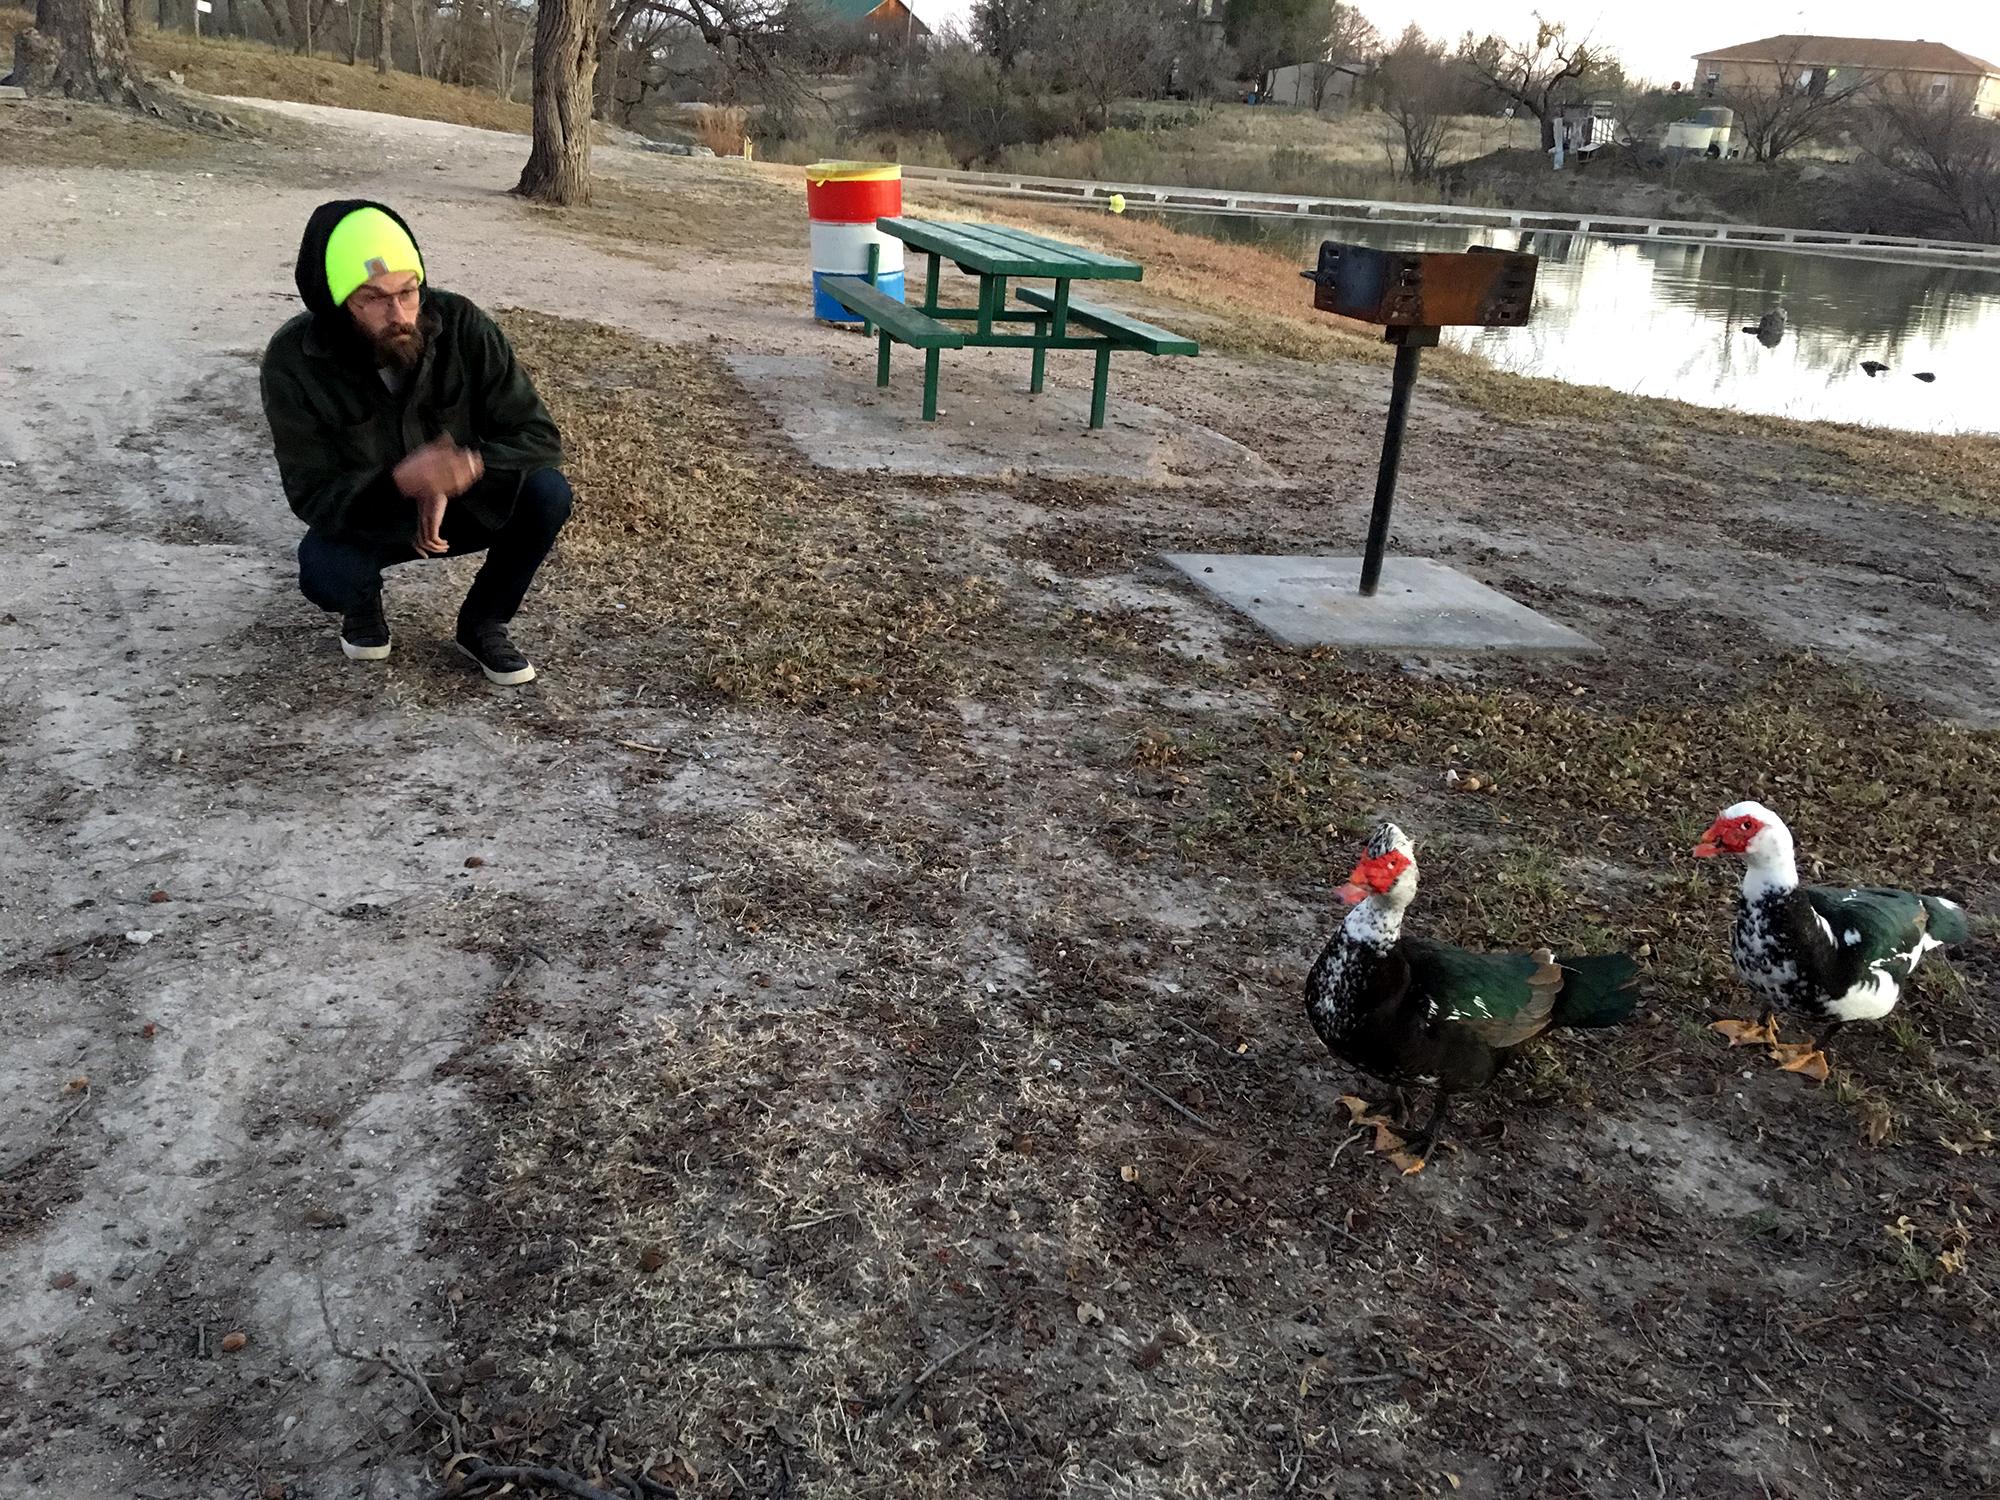 Generic Van Life - Austin Muscovy Ducks